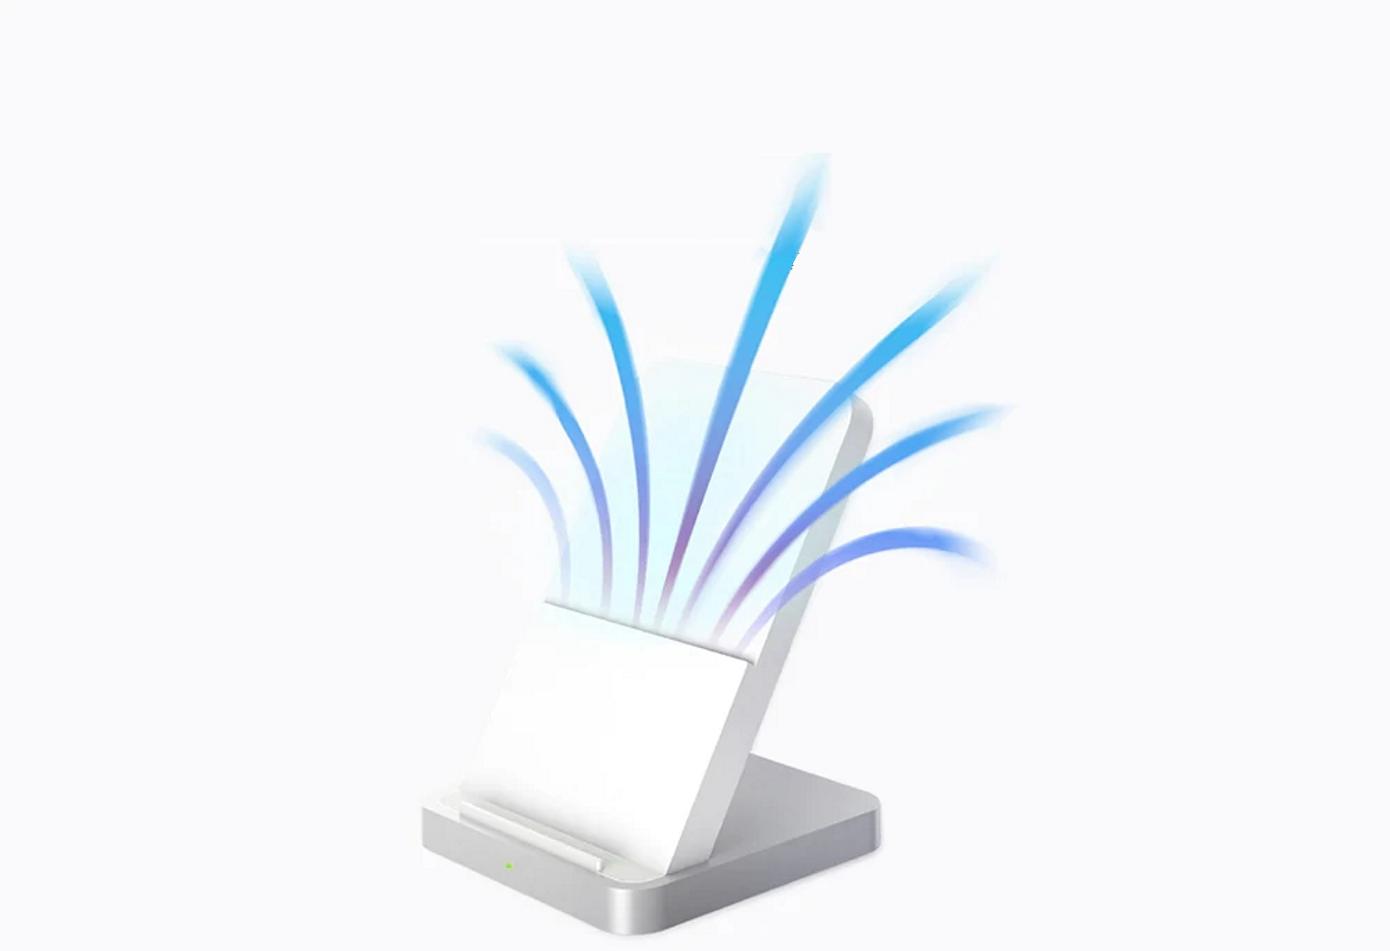 Opisanie Besprovodnoe Zaryadnoe Ustrojstvo Xiaomi Vertical Air Cooled Wireless Charger 30w Mdy 11 Eg 5